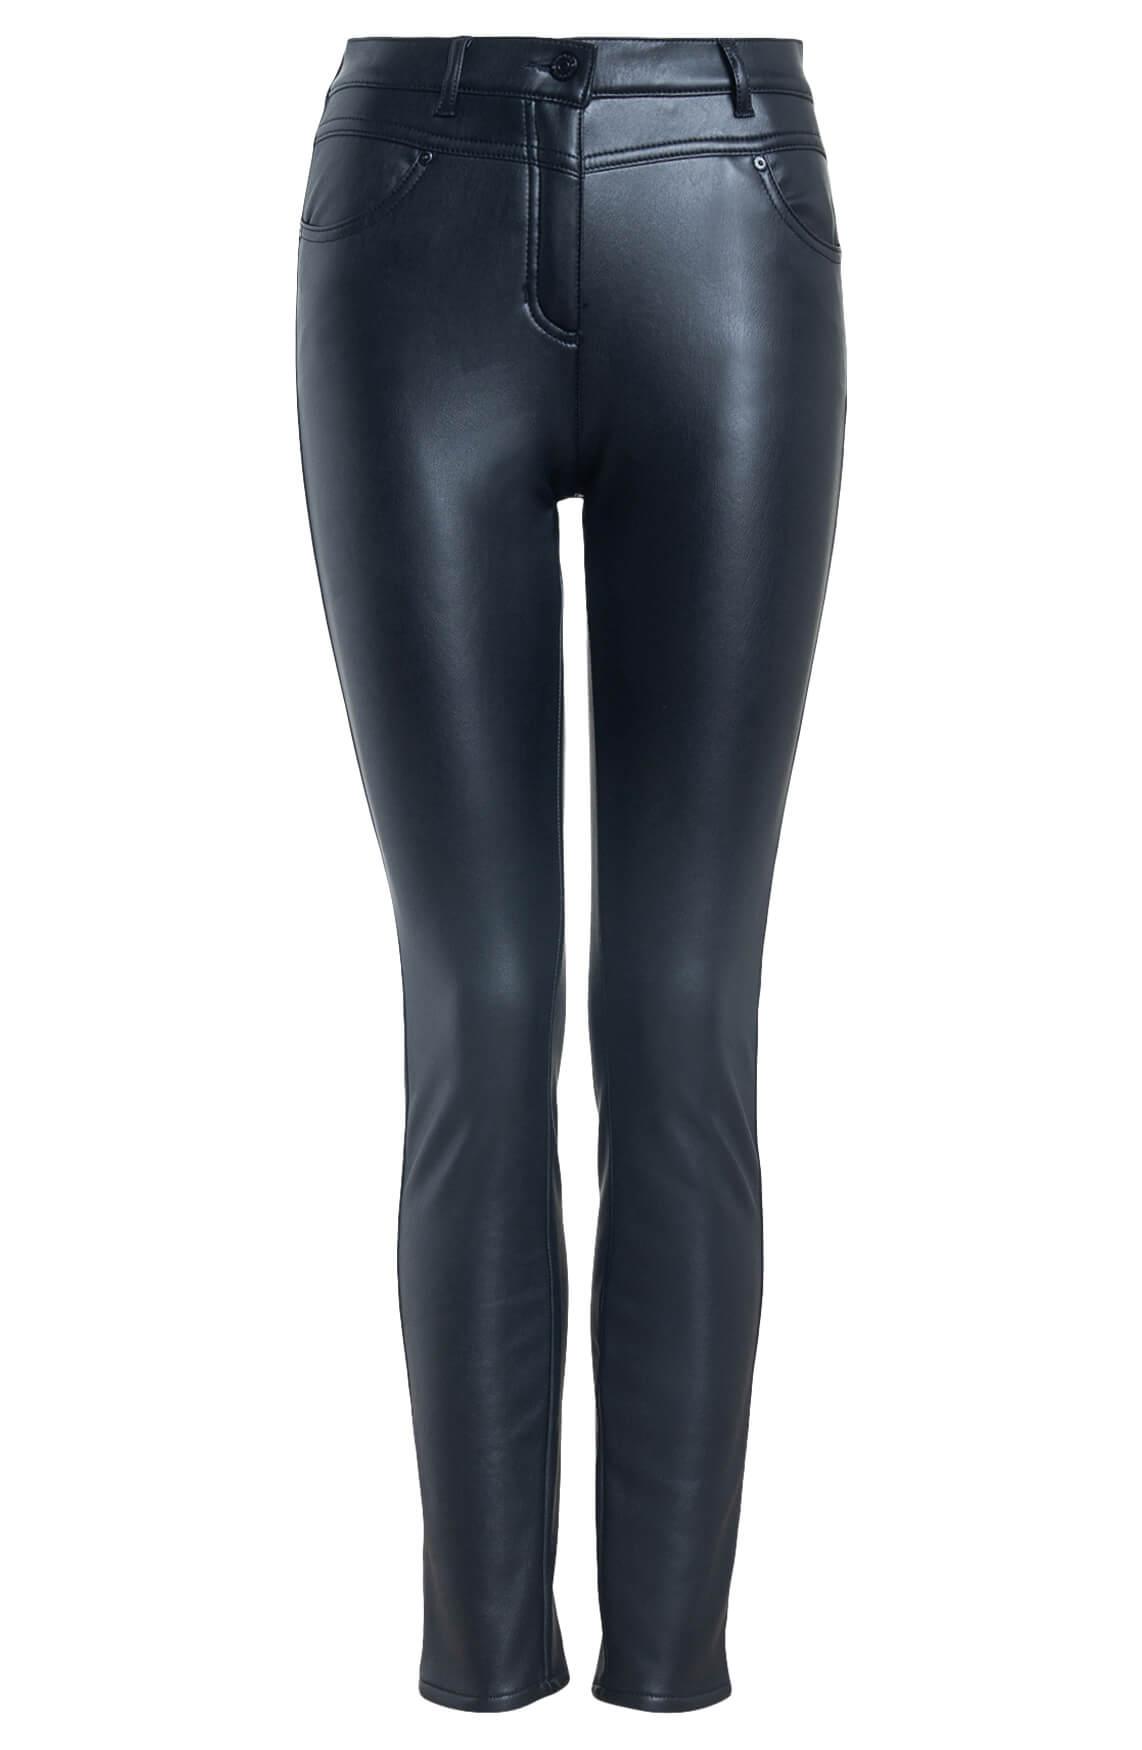 Rosner Dames L30 Antonia skinny zwart